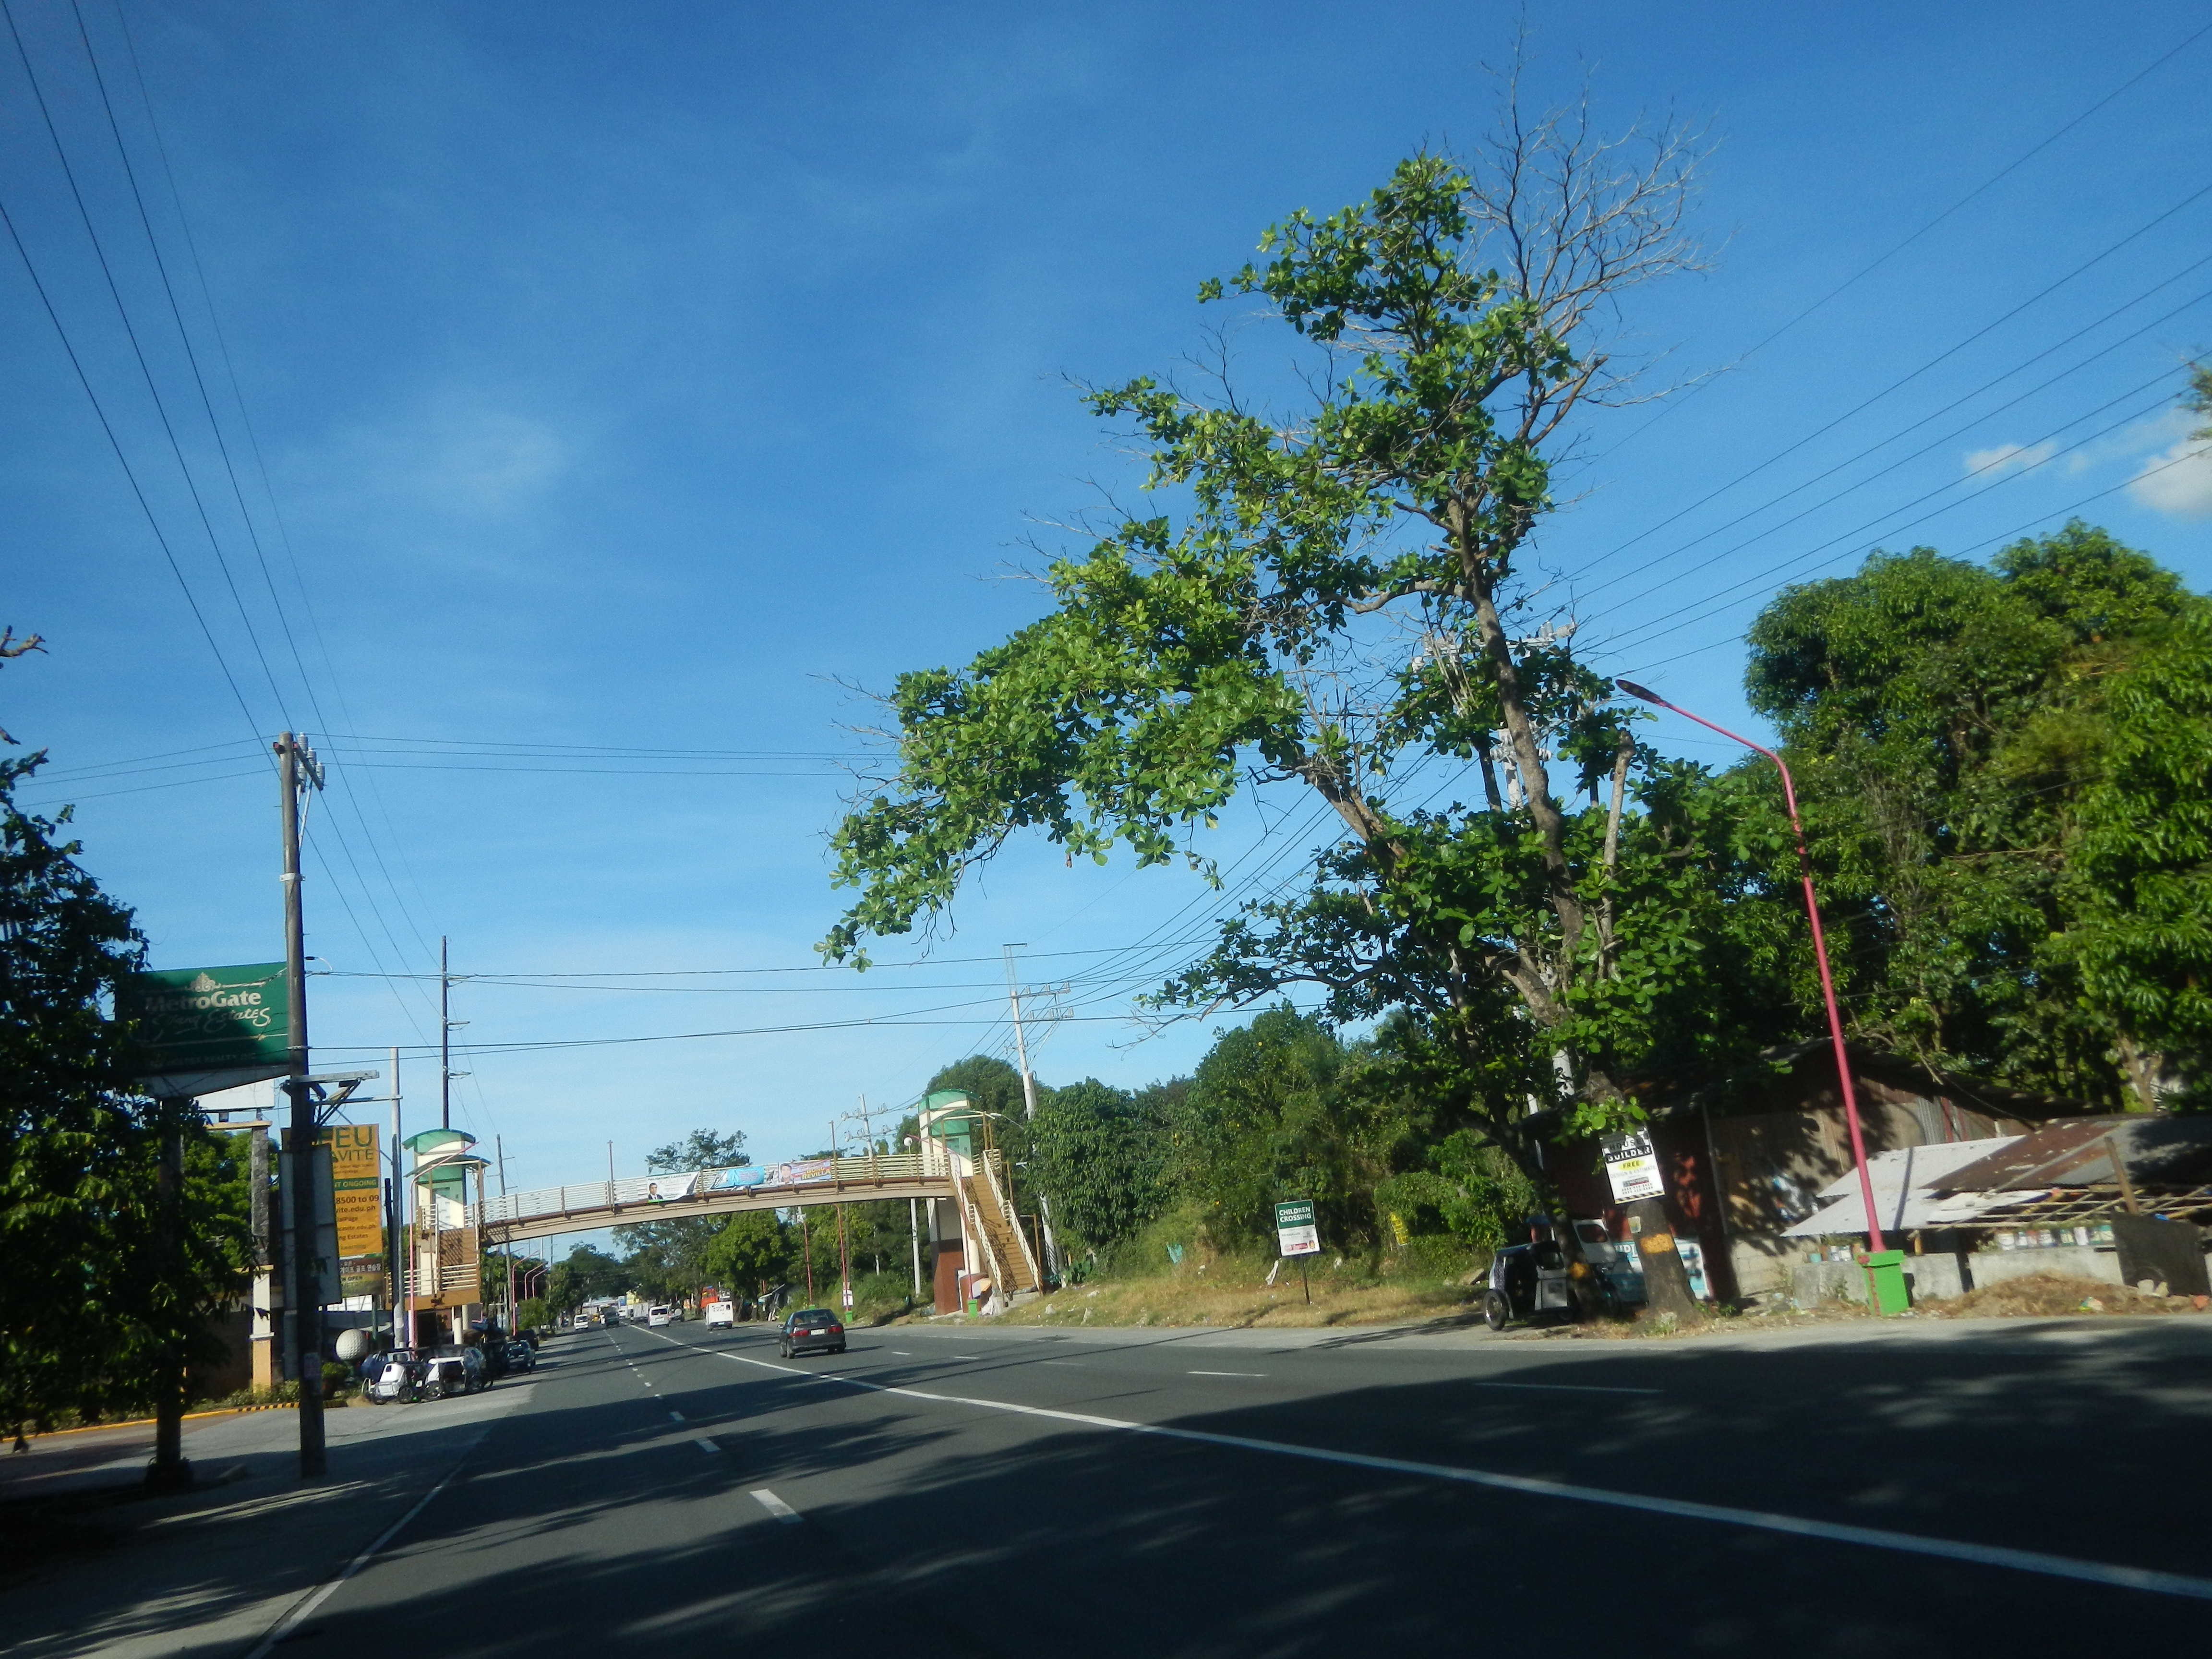 File:7924Silang, Cavite Landmarks Barangays 12.jpg